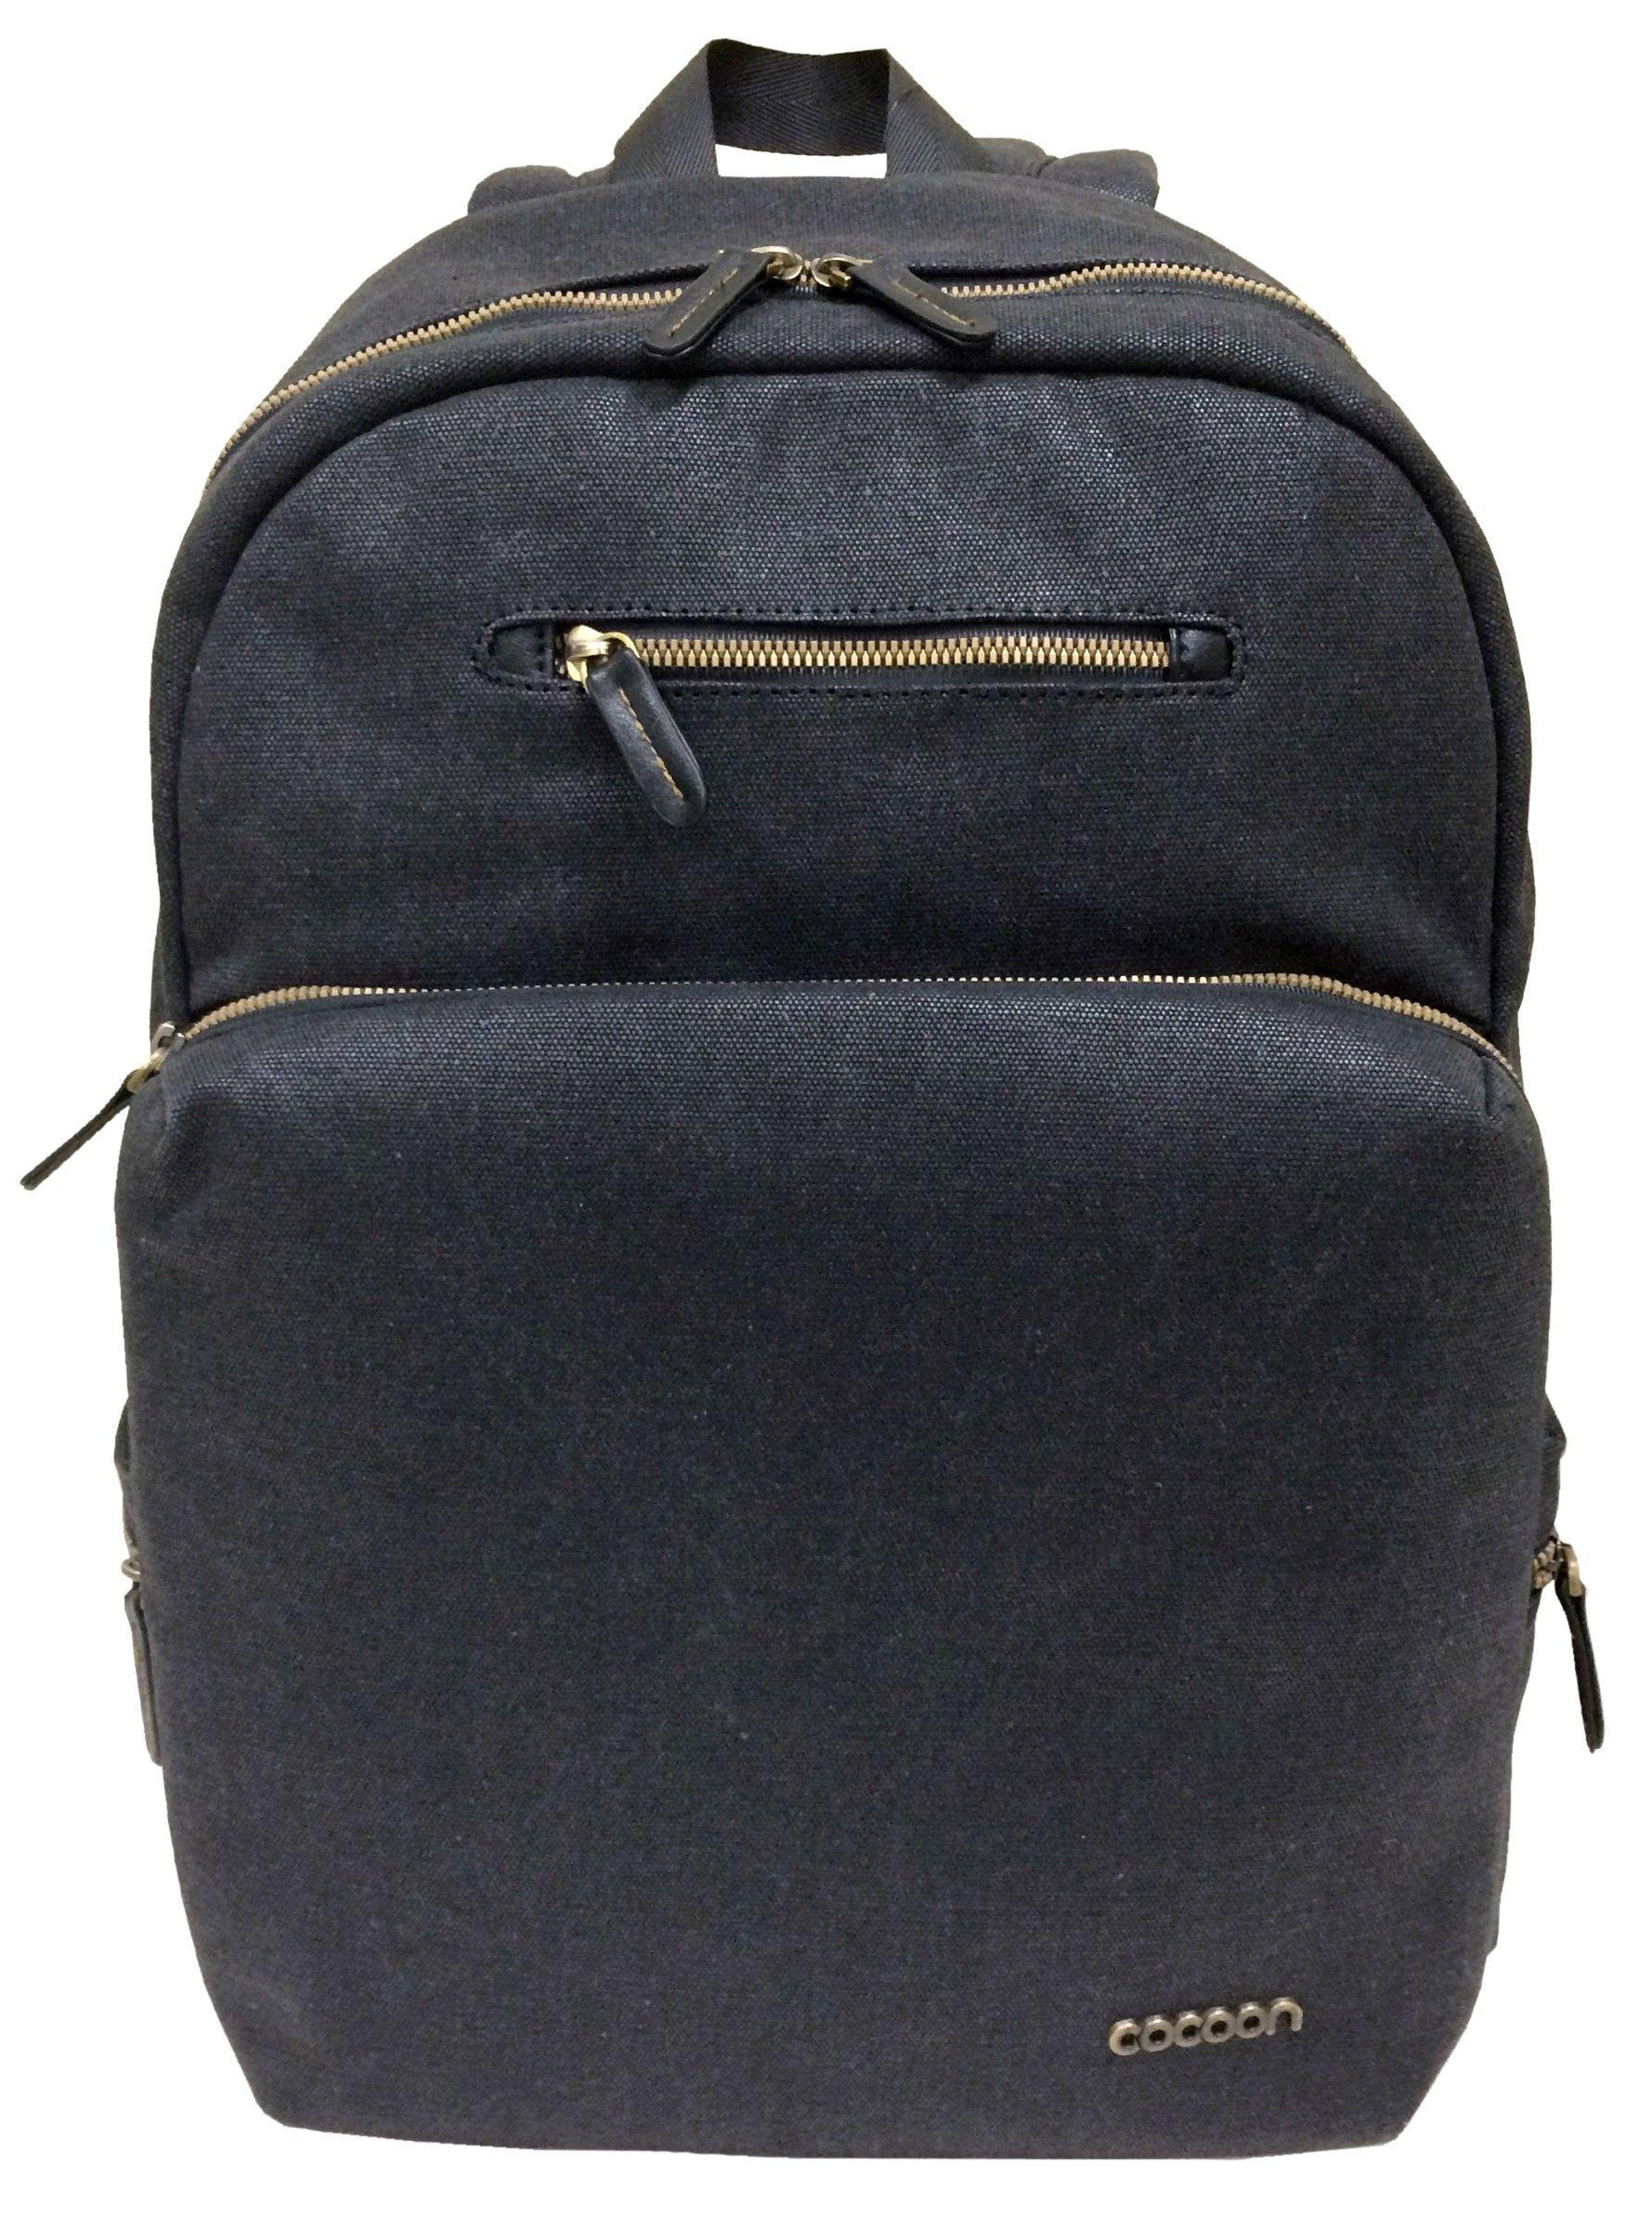 Black backpack laptop bag for women backpacks